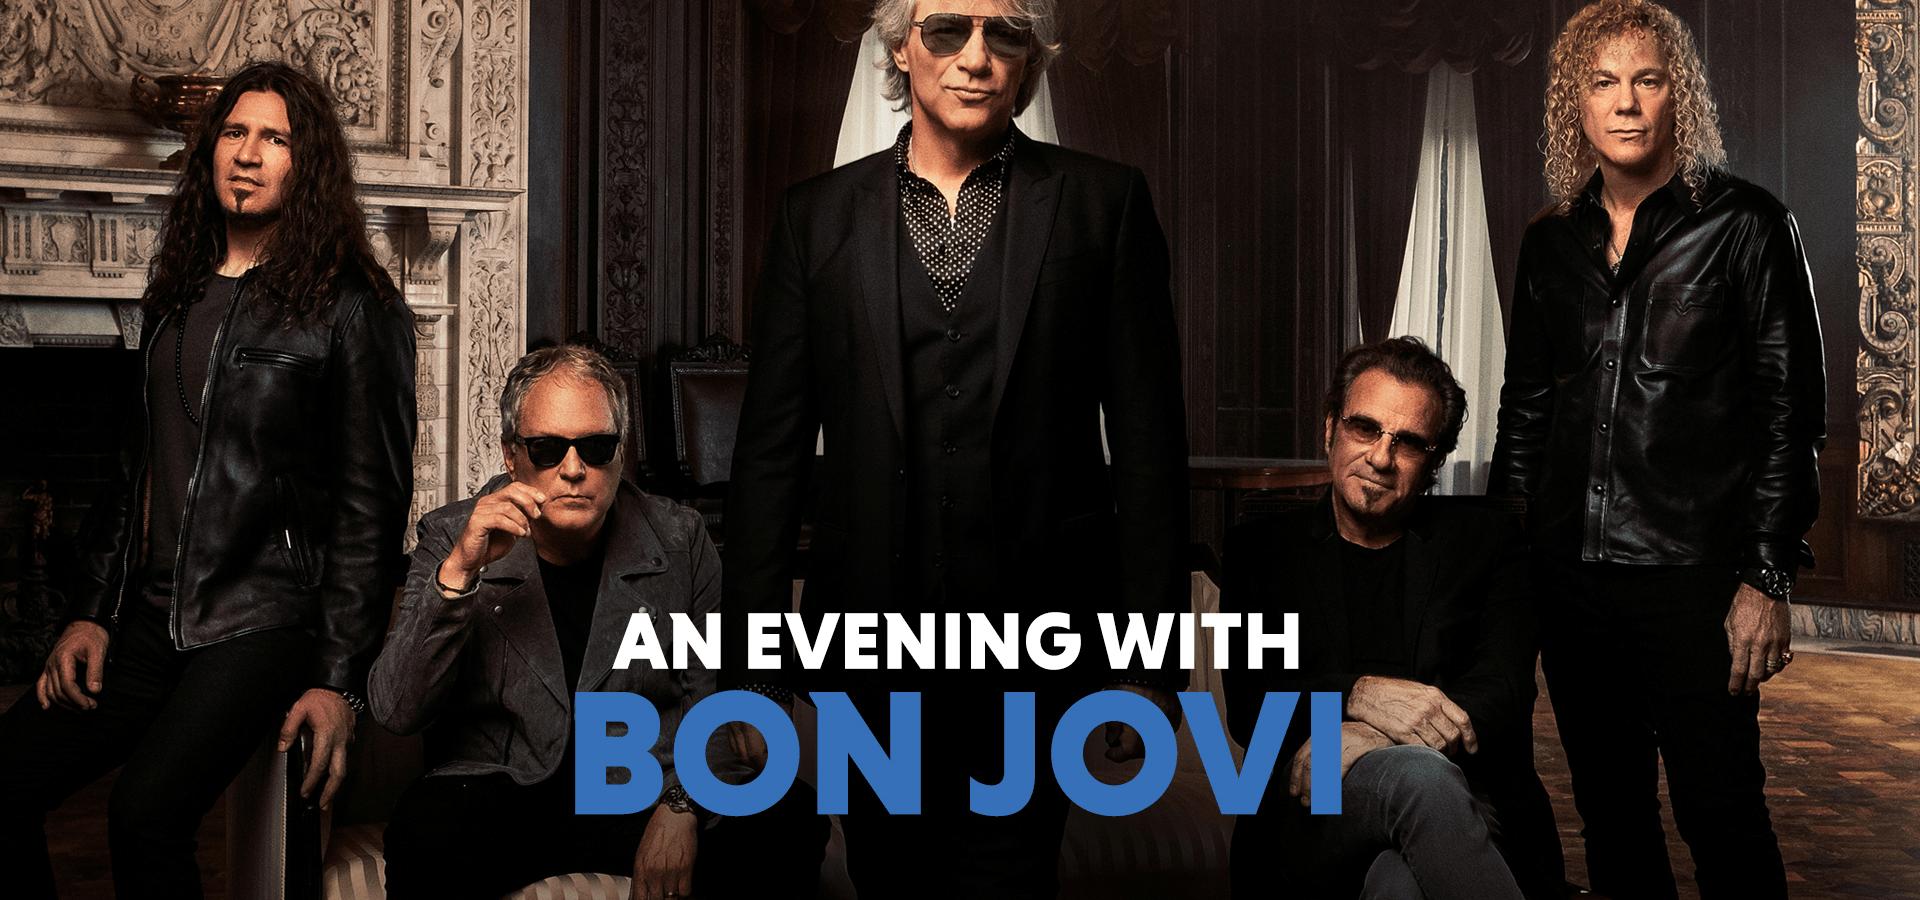 An Evening with Bon Jovi